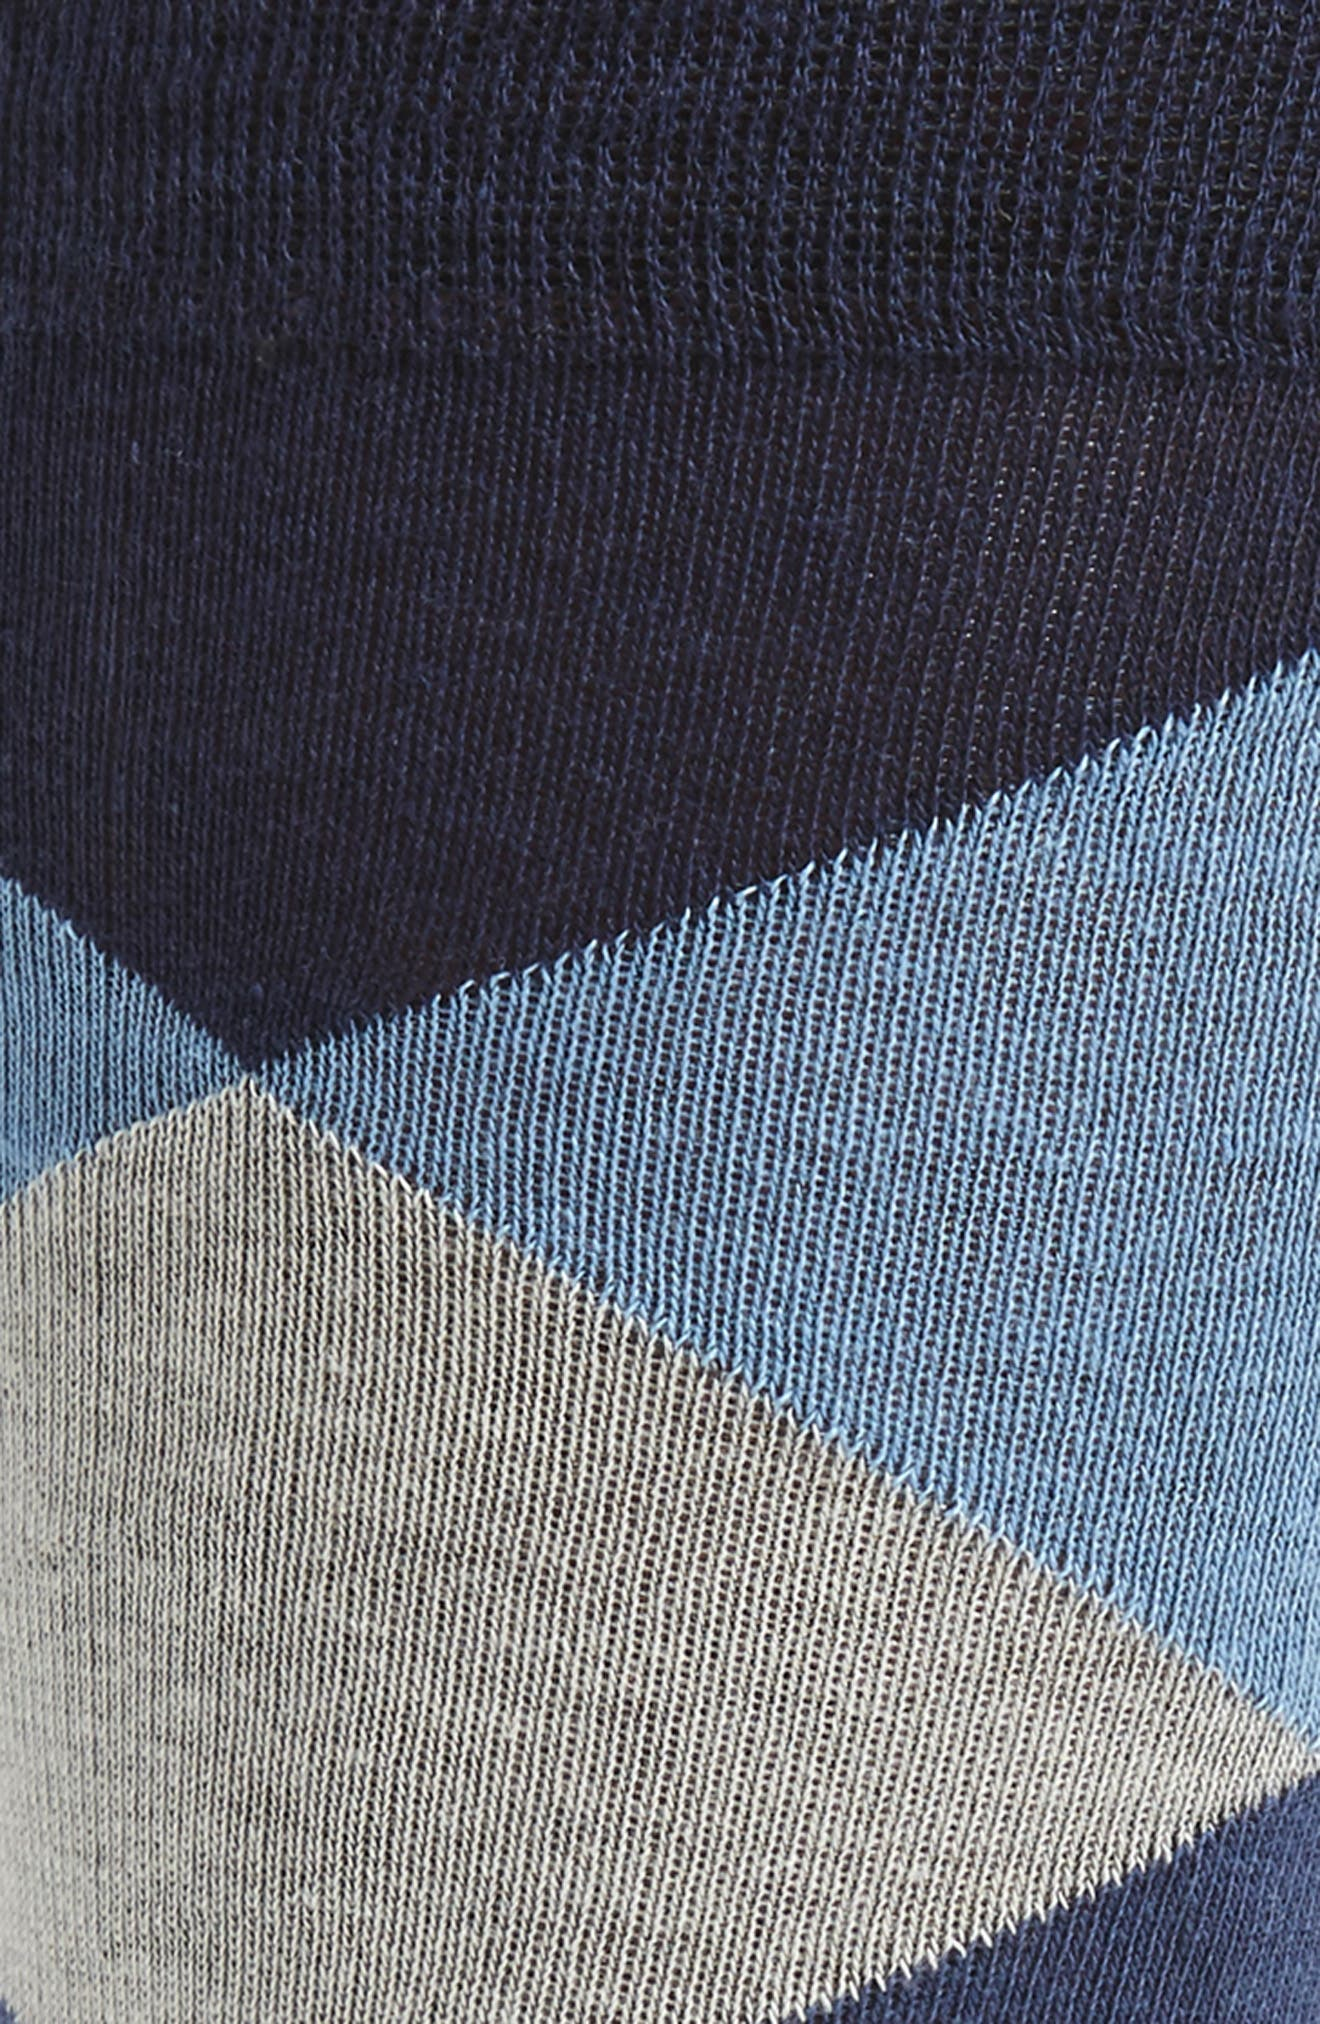 Large Diamond Crew Socks,                             Alternate thumbnail 2, color,                             Marine Blue